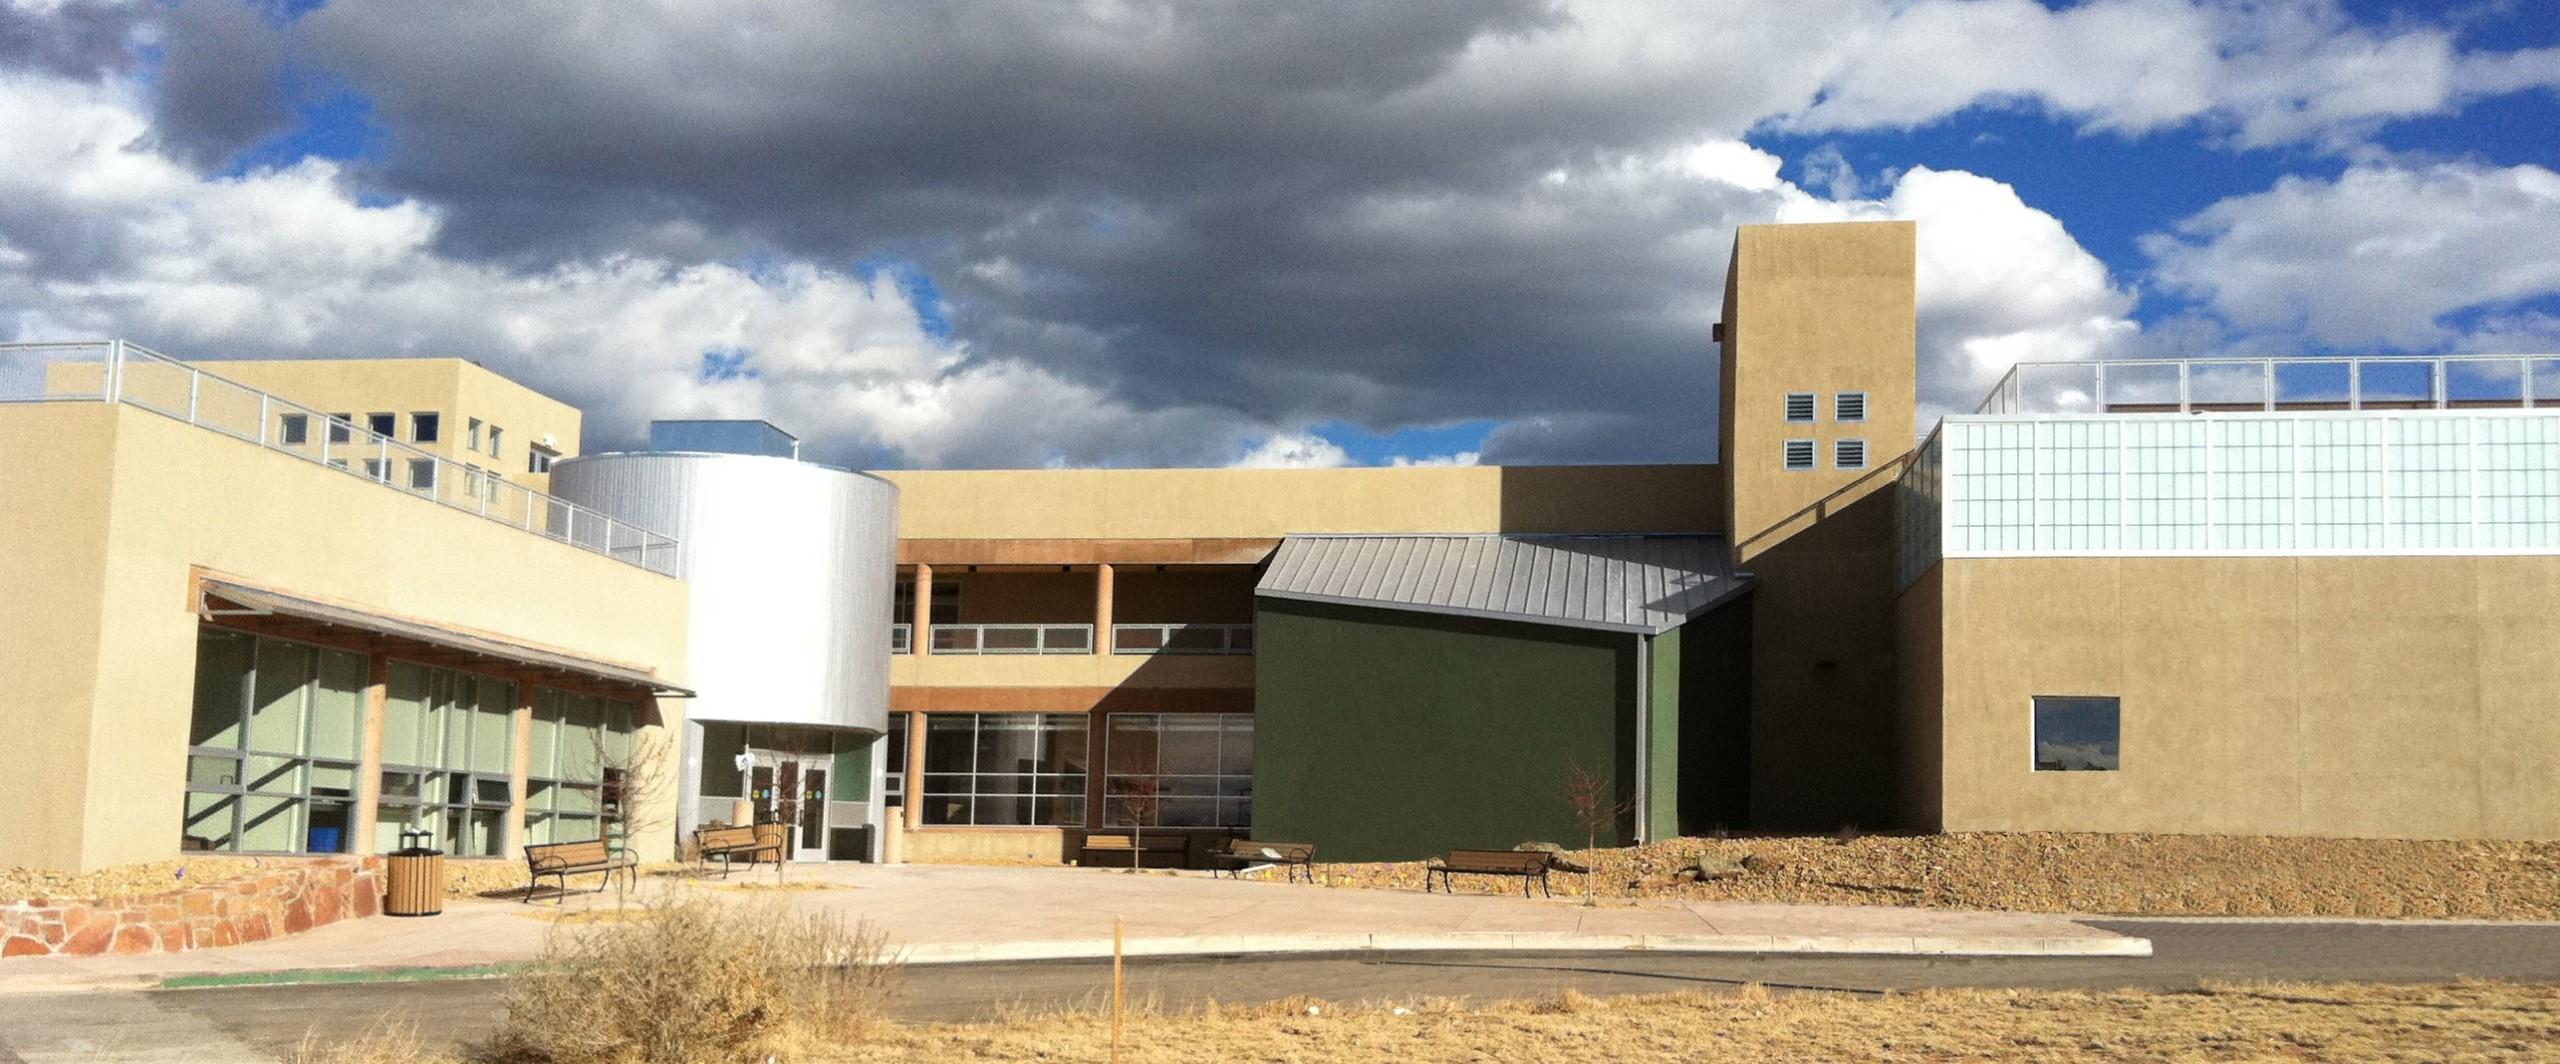 Santa Fe Community College